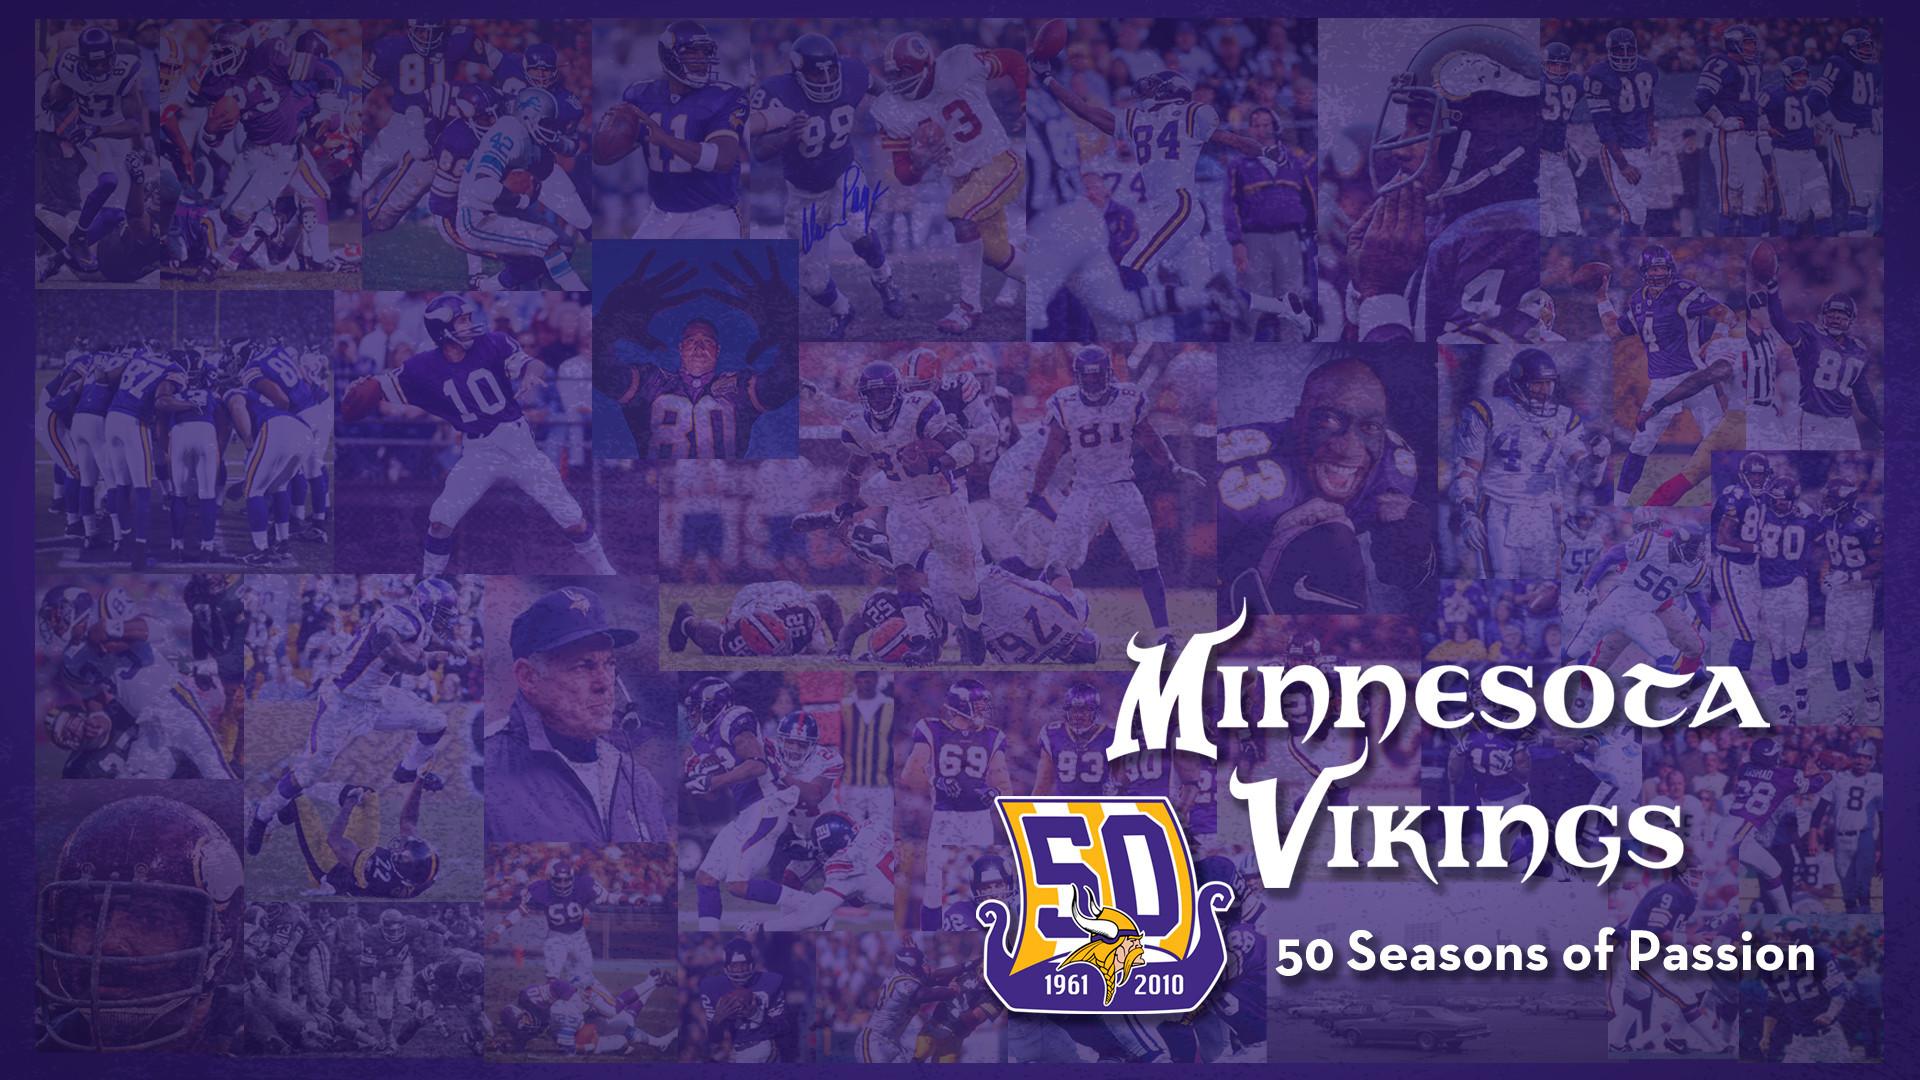 Minnesota Vikings Logo Wide Wallpaper 1280X800 04 26 2011 Vikings .